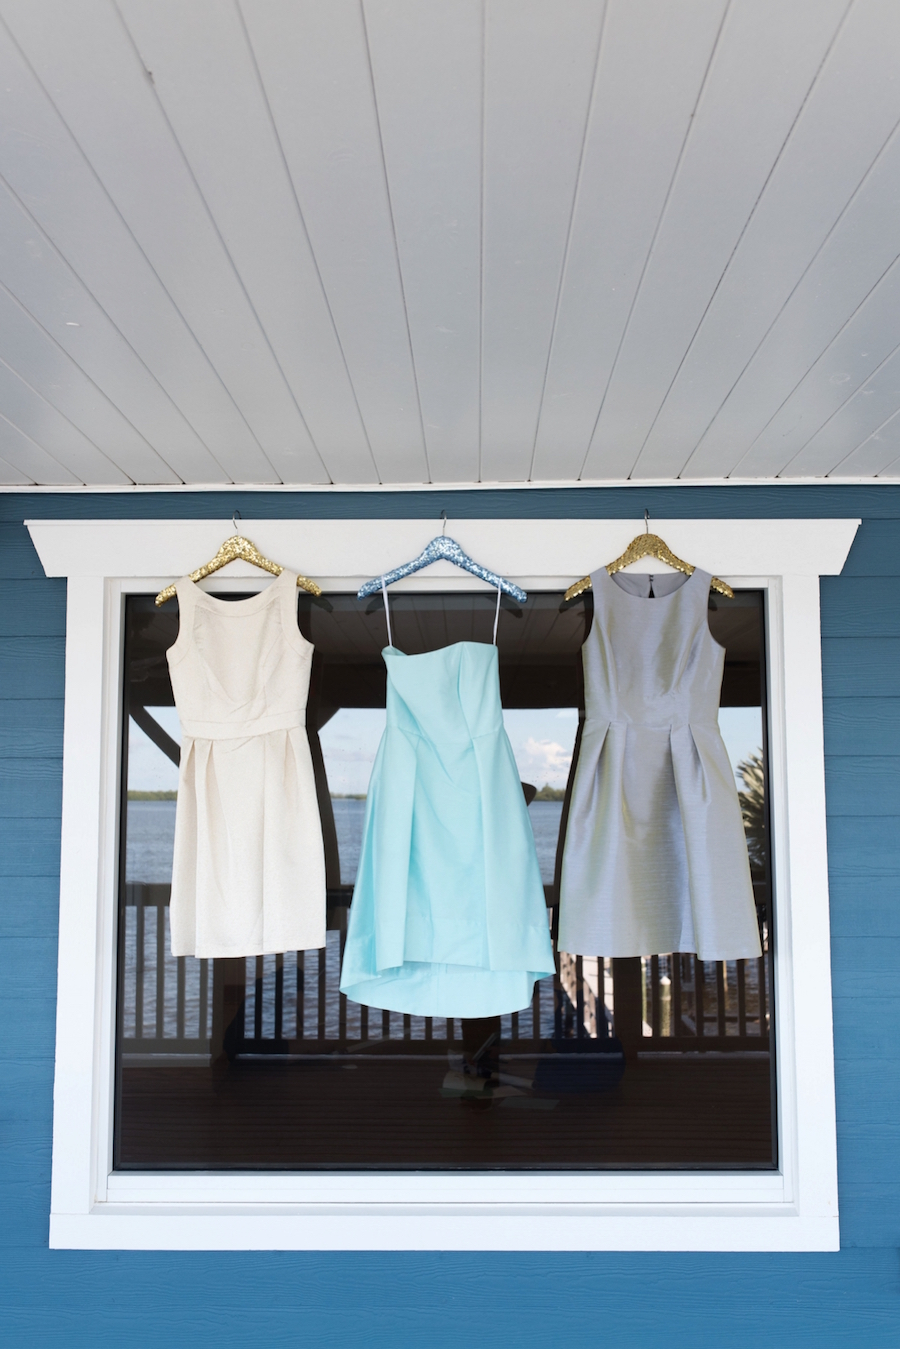 Cocktail Length Bridesmaid Wedding Dresses by Dessy | Ivory, Light Blue and Gray Bridesmaid Dresses| Tampa Bay Wedding Photographer, Caroline & Evan Photography